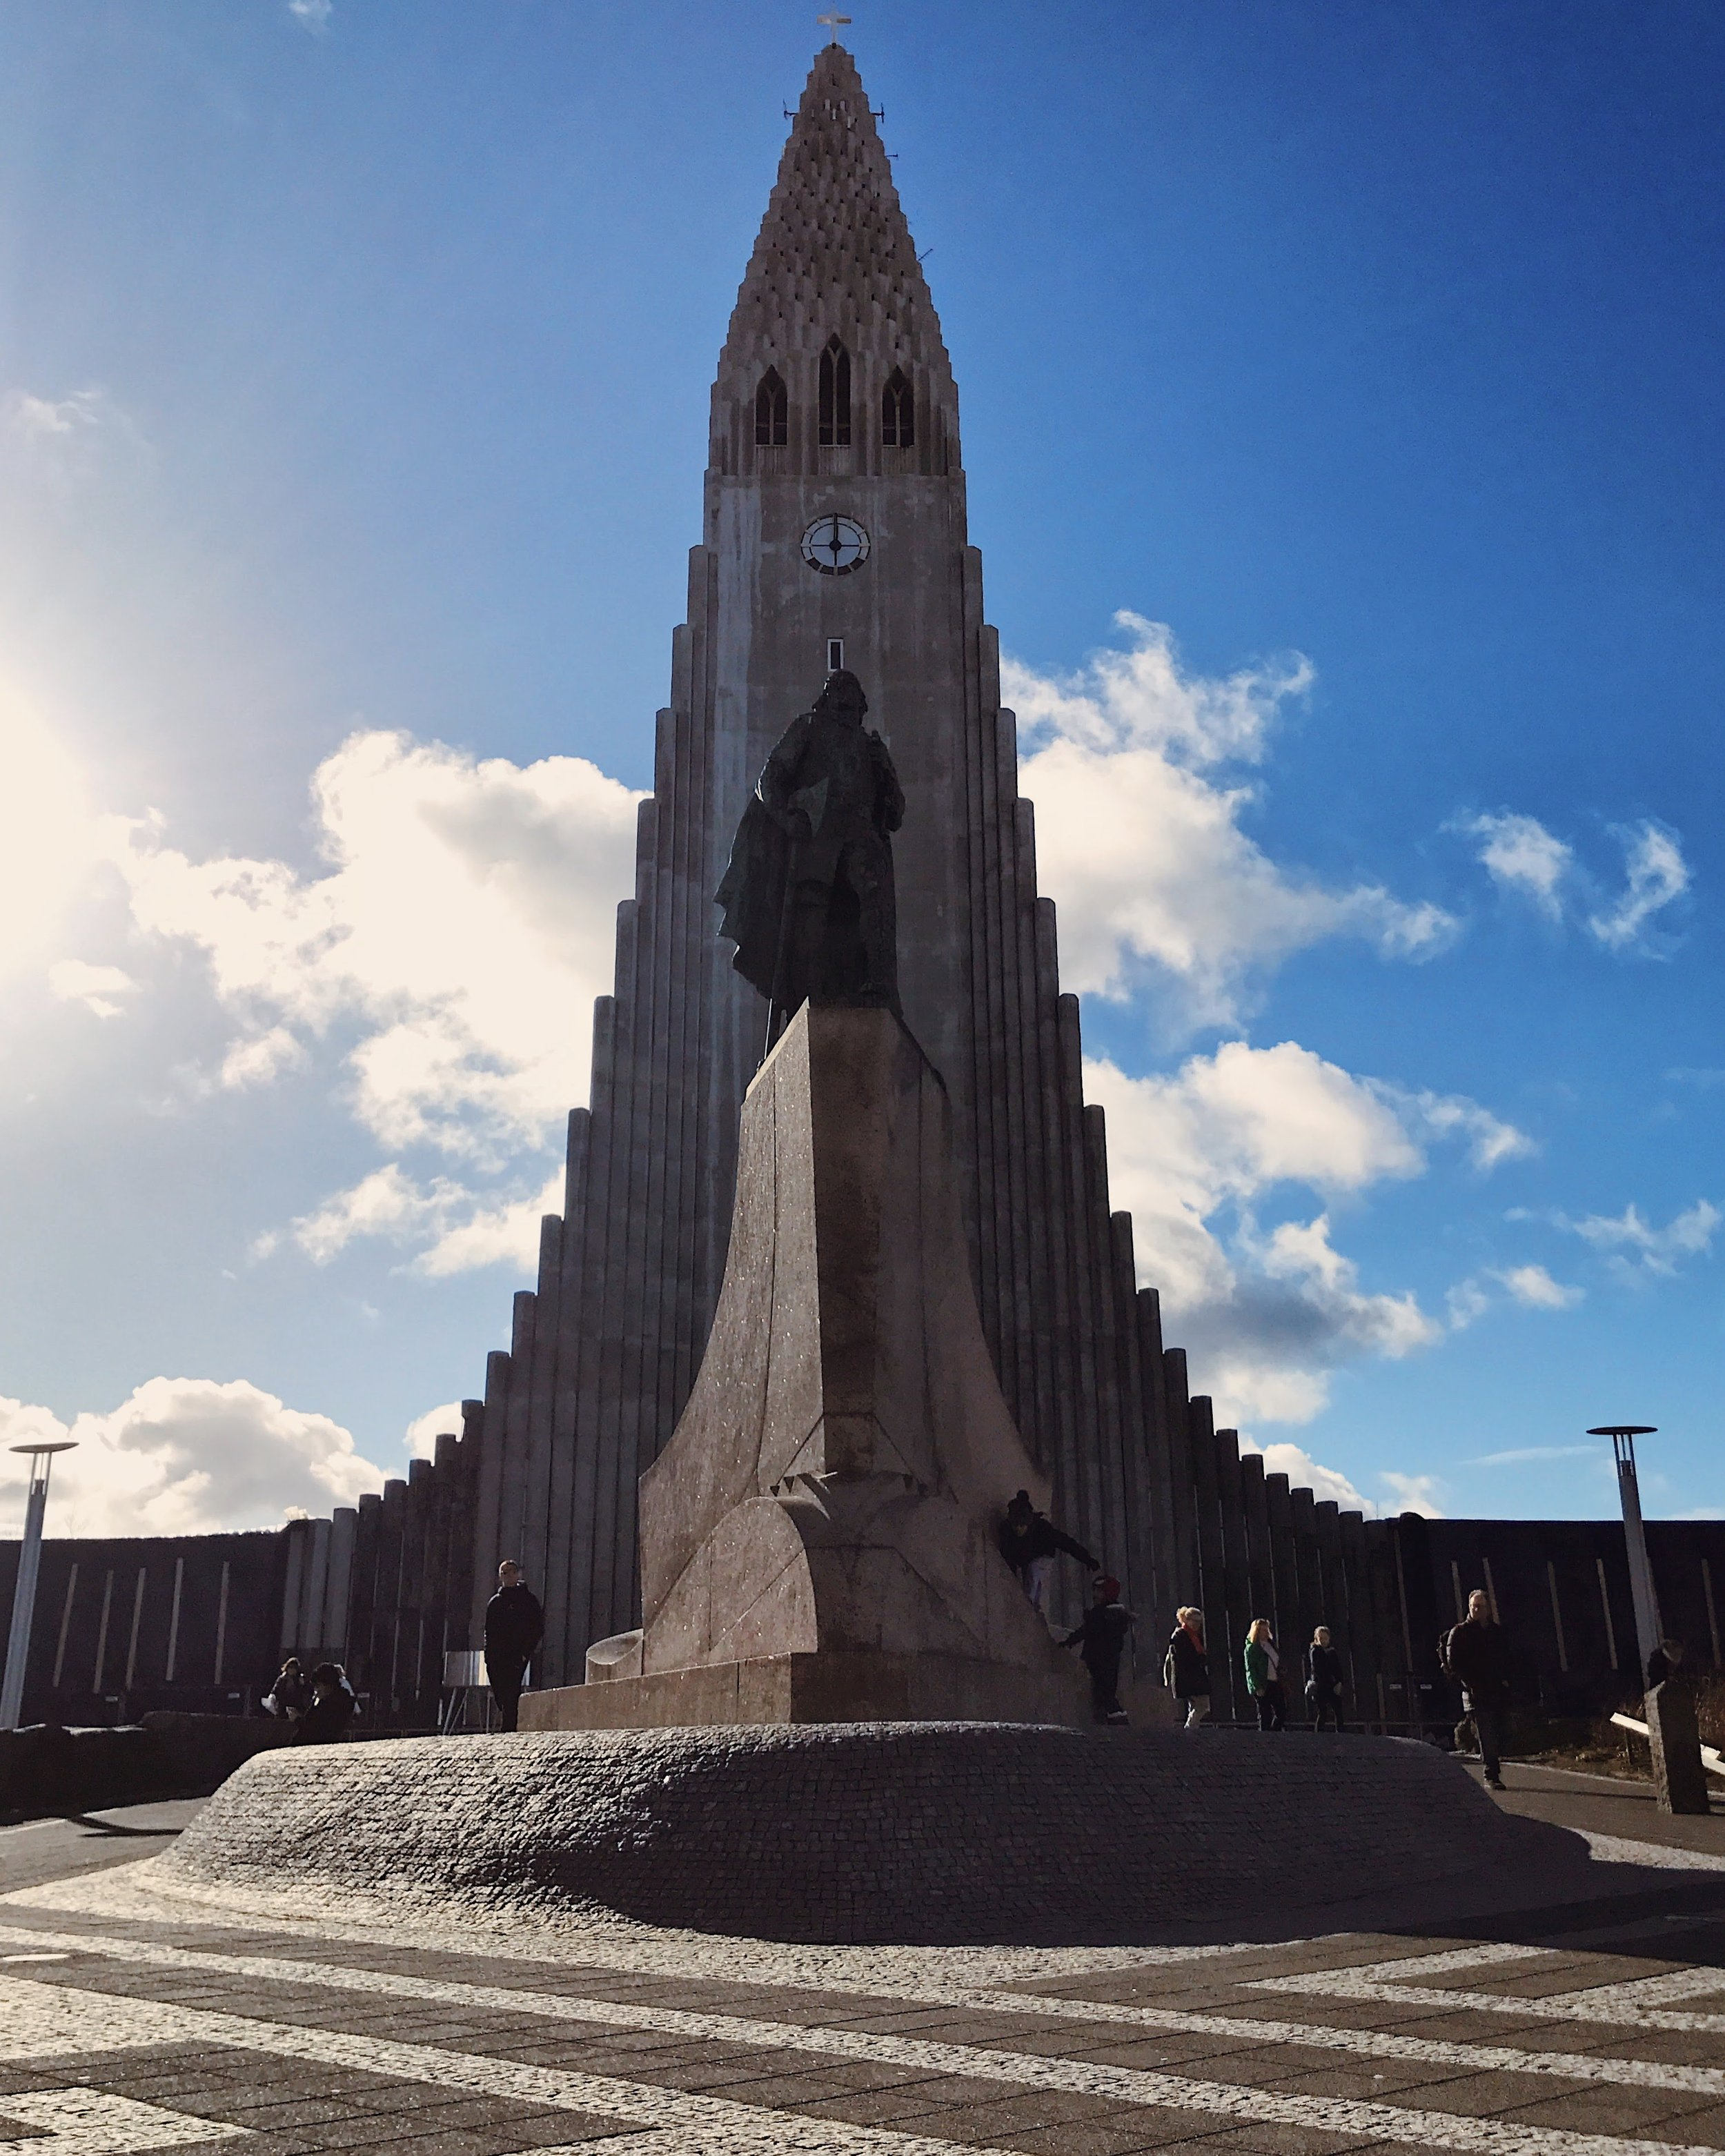 Hallgrímskirkja, the large church in the middle of Reykjavik.